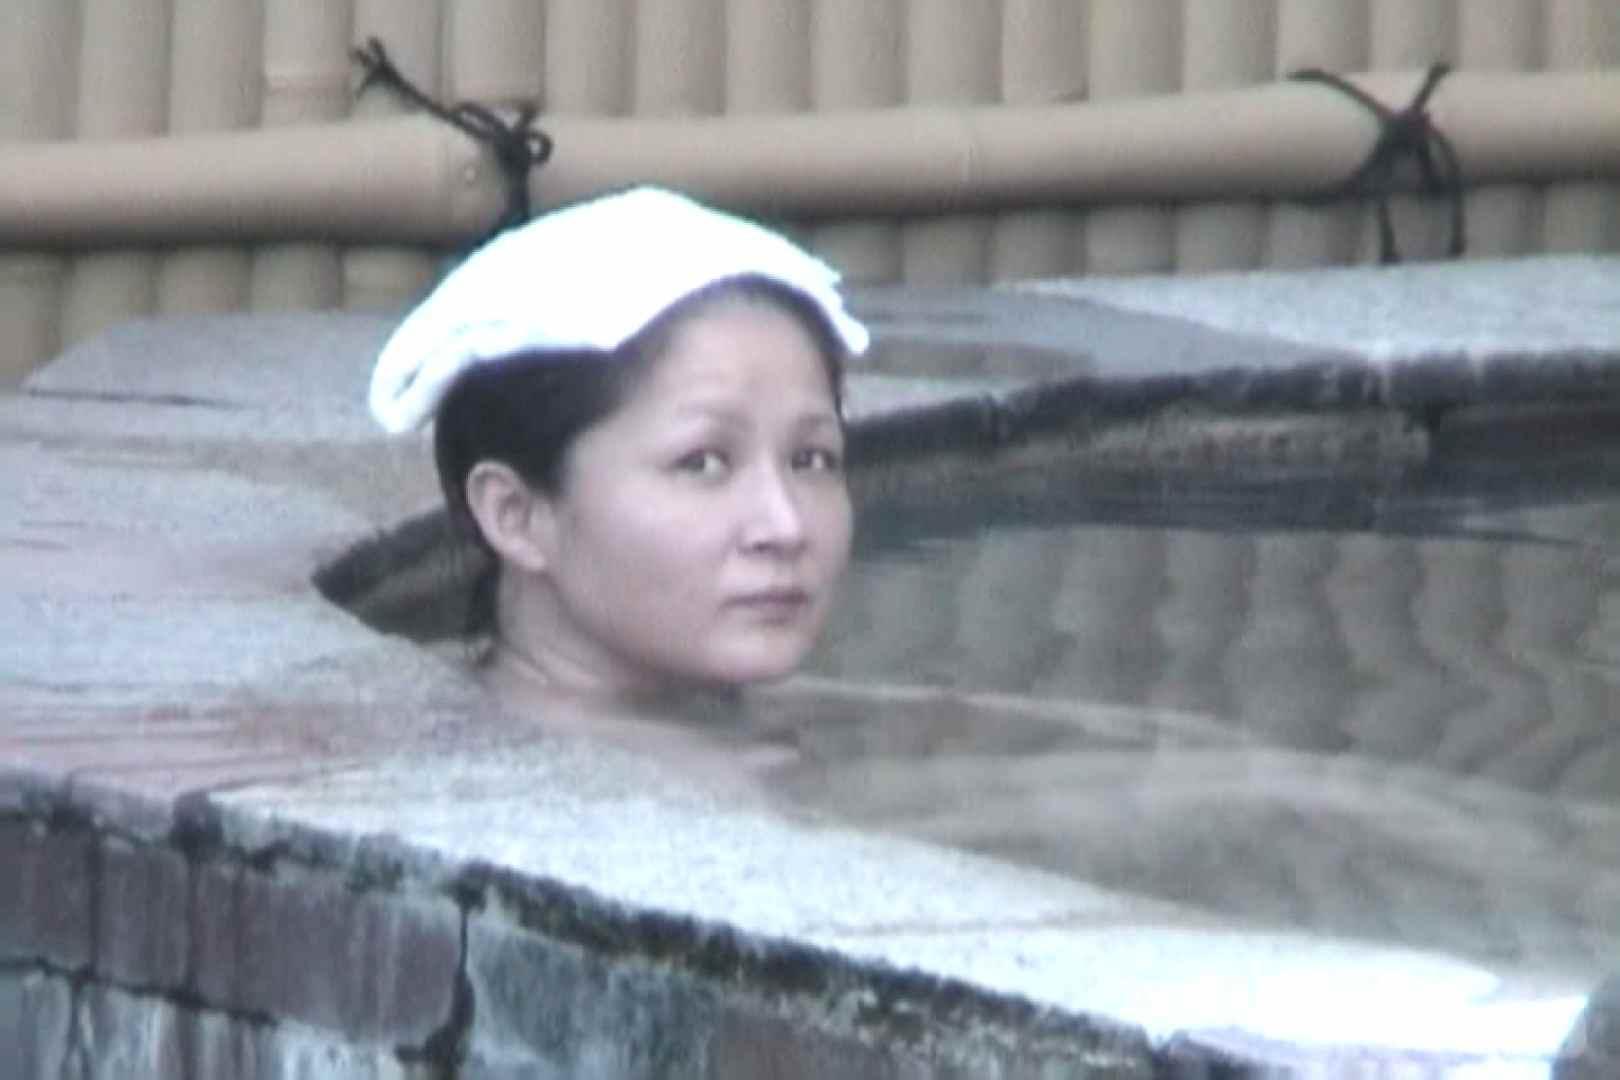 Aquaな露天風呂Vol.845 OLのプライベート AV無料動画キャプチャ 11pic 8